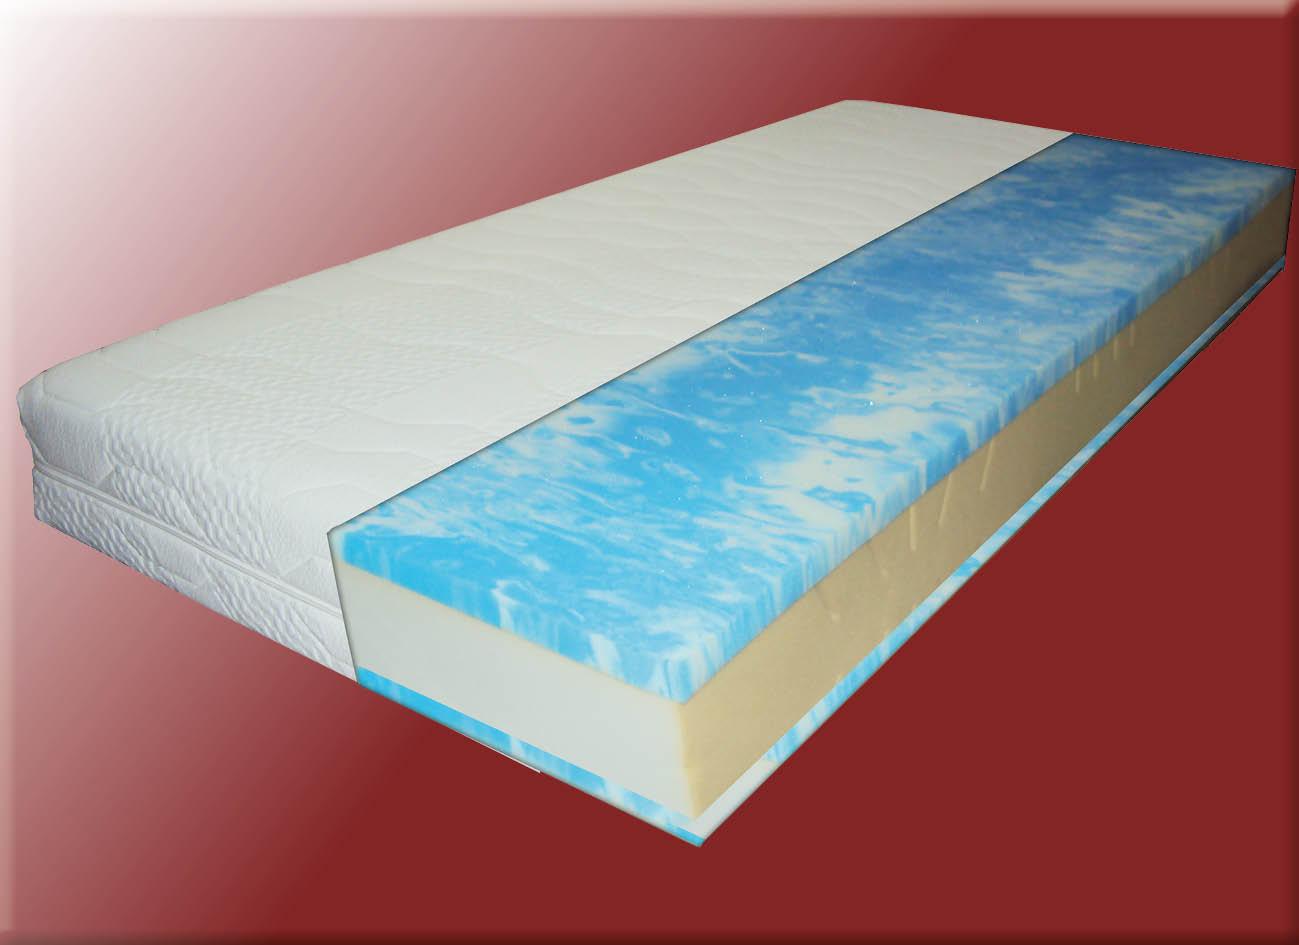 maxx 193 duo gel 1073 80x200 kaltschaum matratze h3. Black Bedroom Furniture Sets. Home Design Ideas